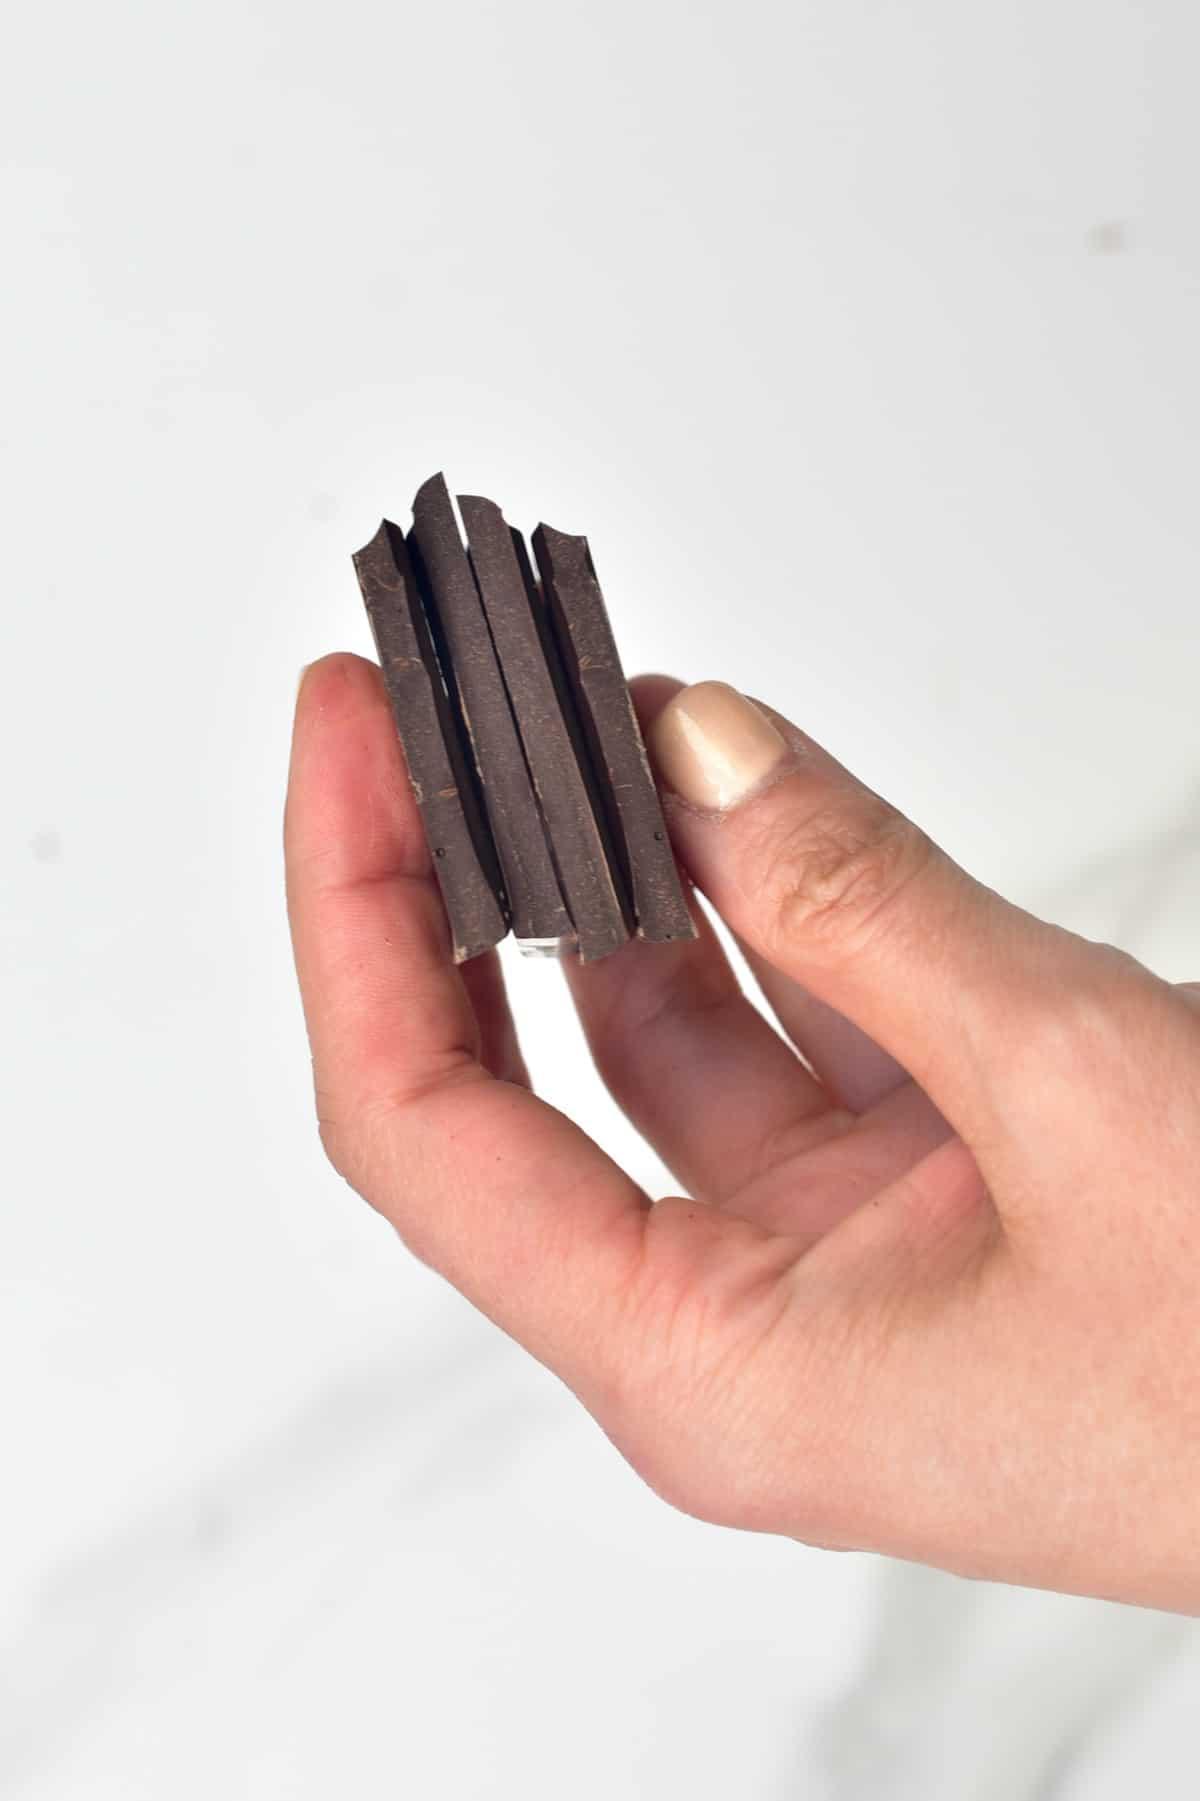 Hand holding homemade chocolate